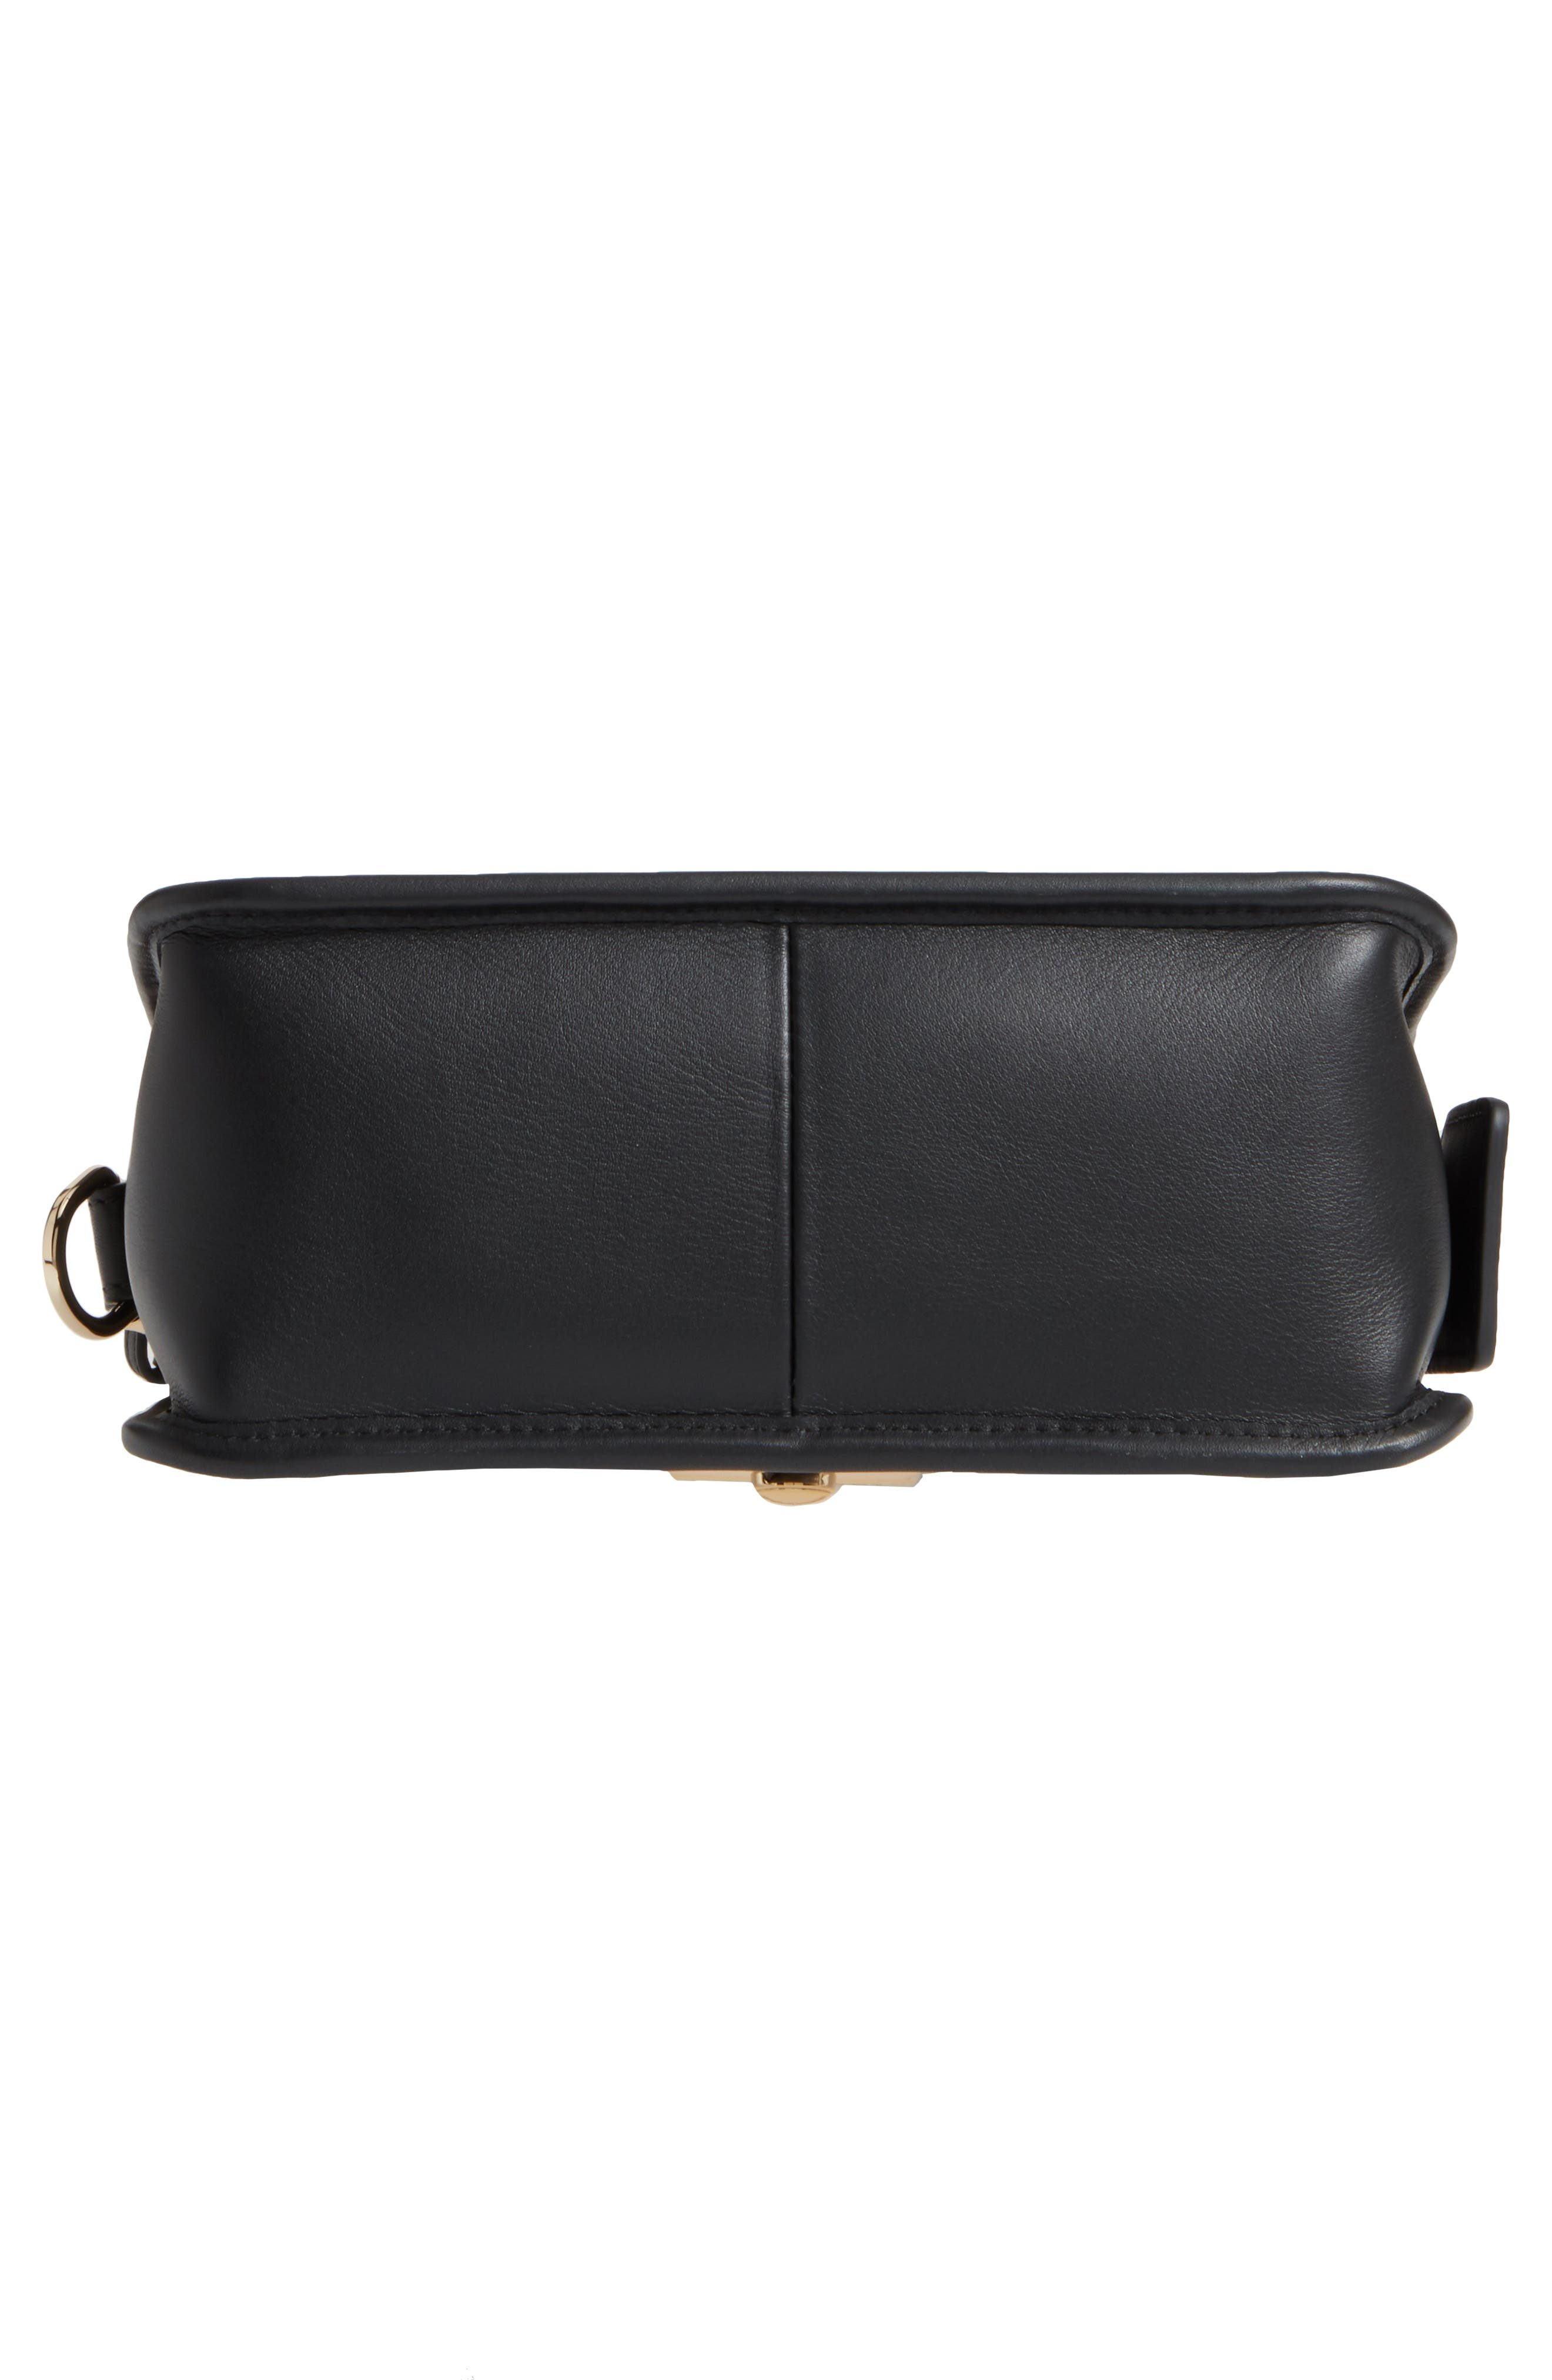 Small Mademoiselle Calfskin Leather Crossbody Bag,                             Alternate thumbnail 6, color,                             Black